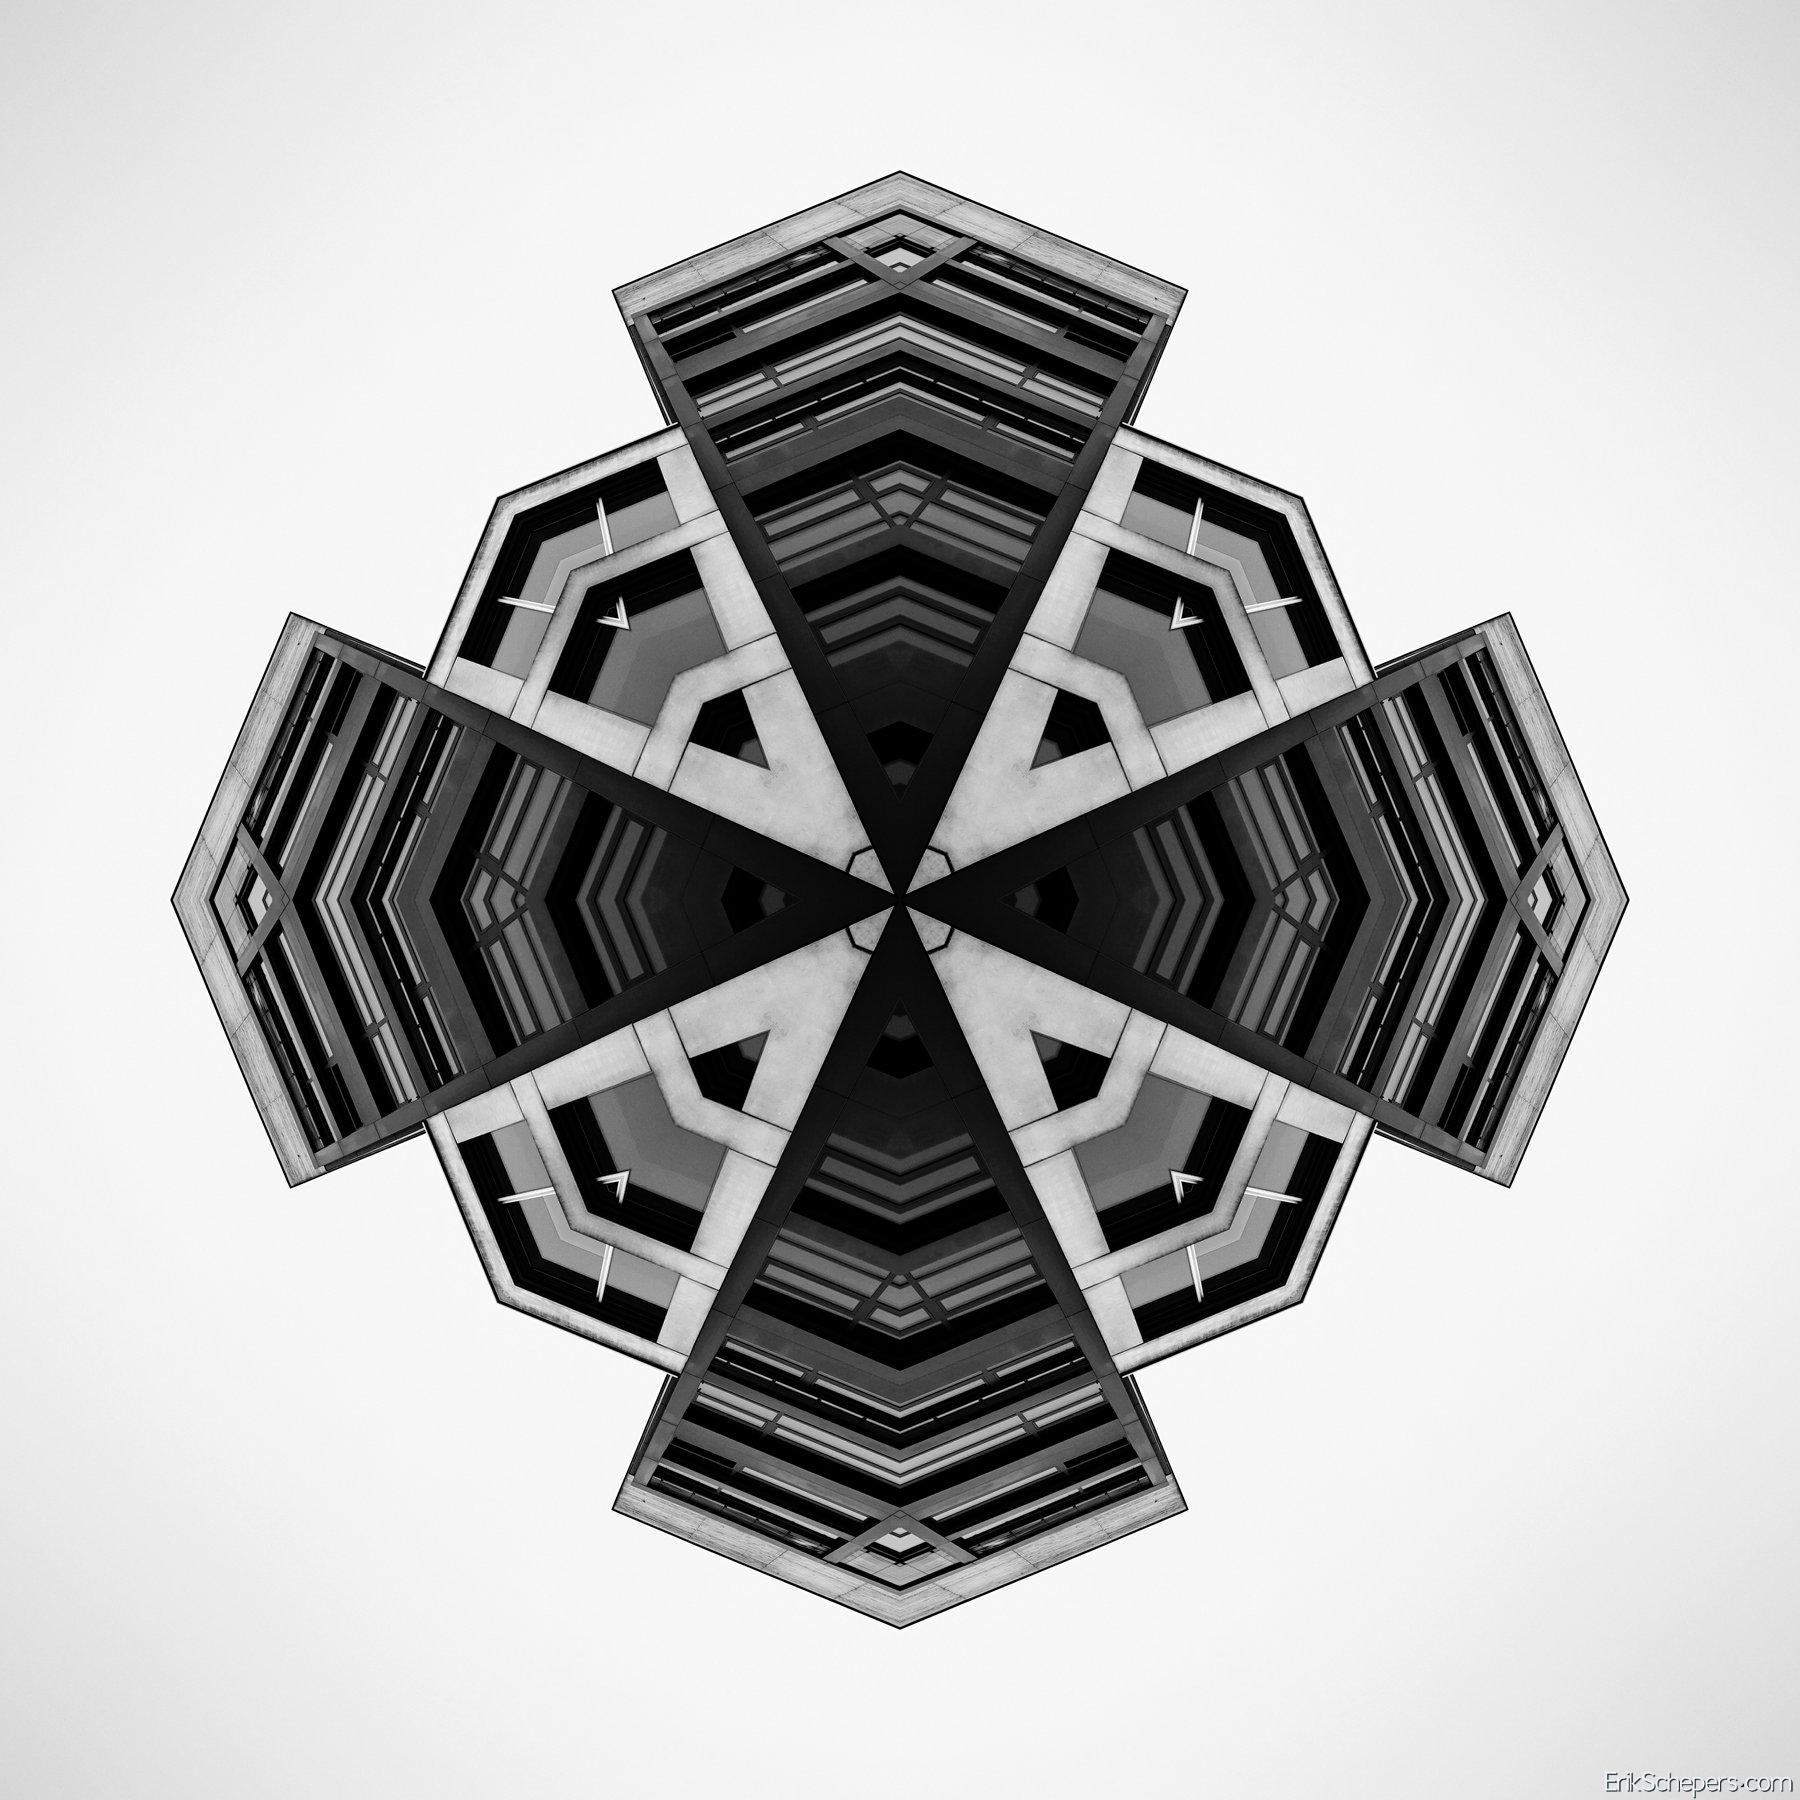 Impossible symmetric architecture 9 erikschepers com for Architecture impossible